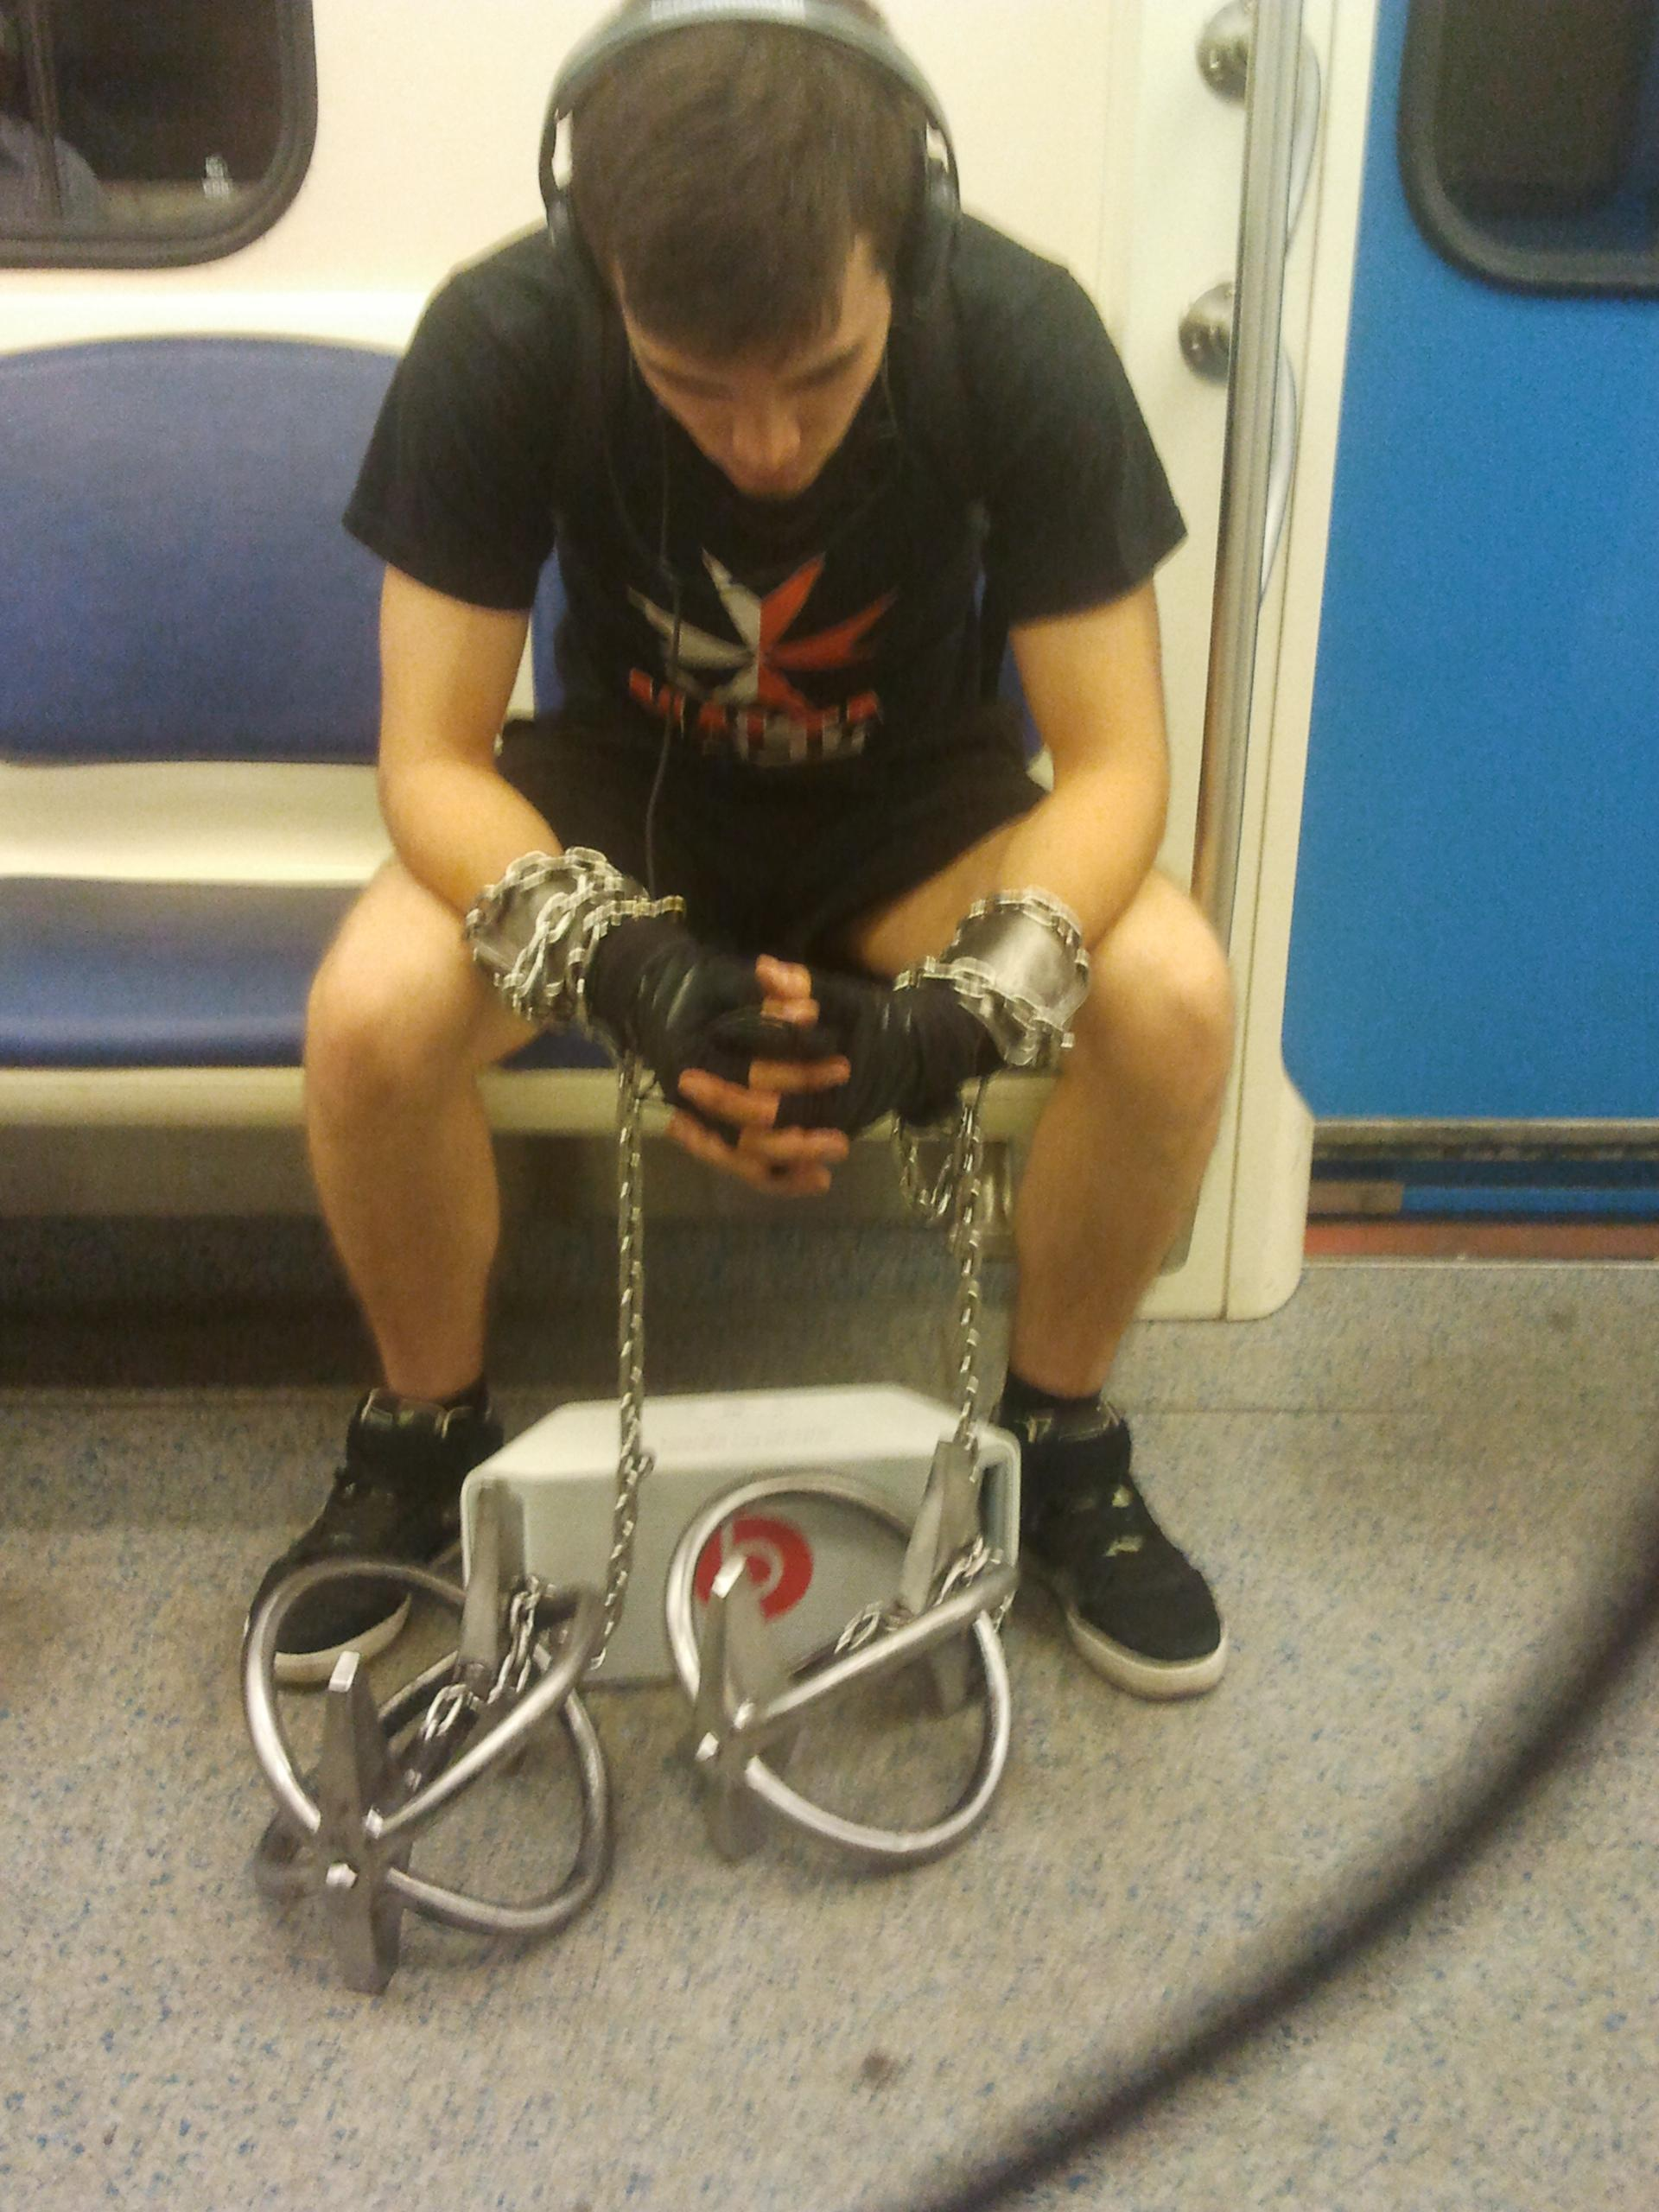 exceptionally-bizarre-subway-people-16